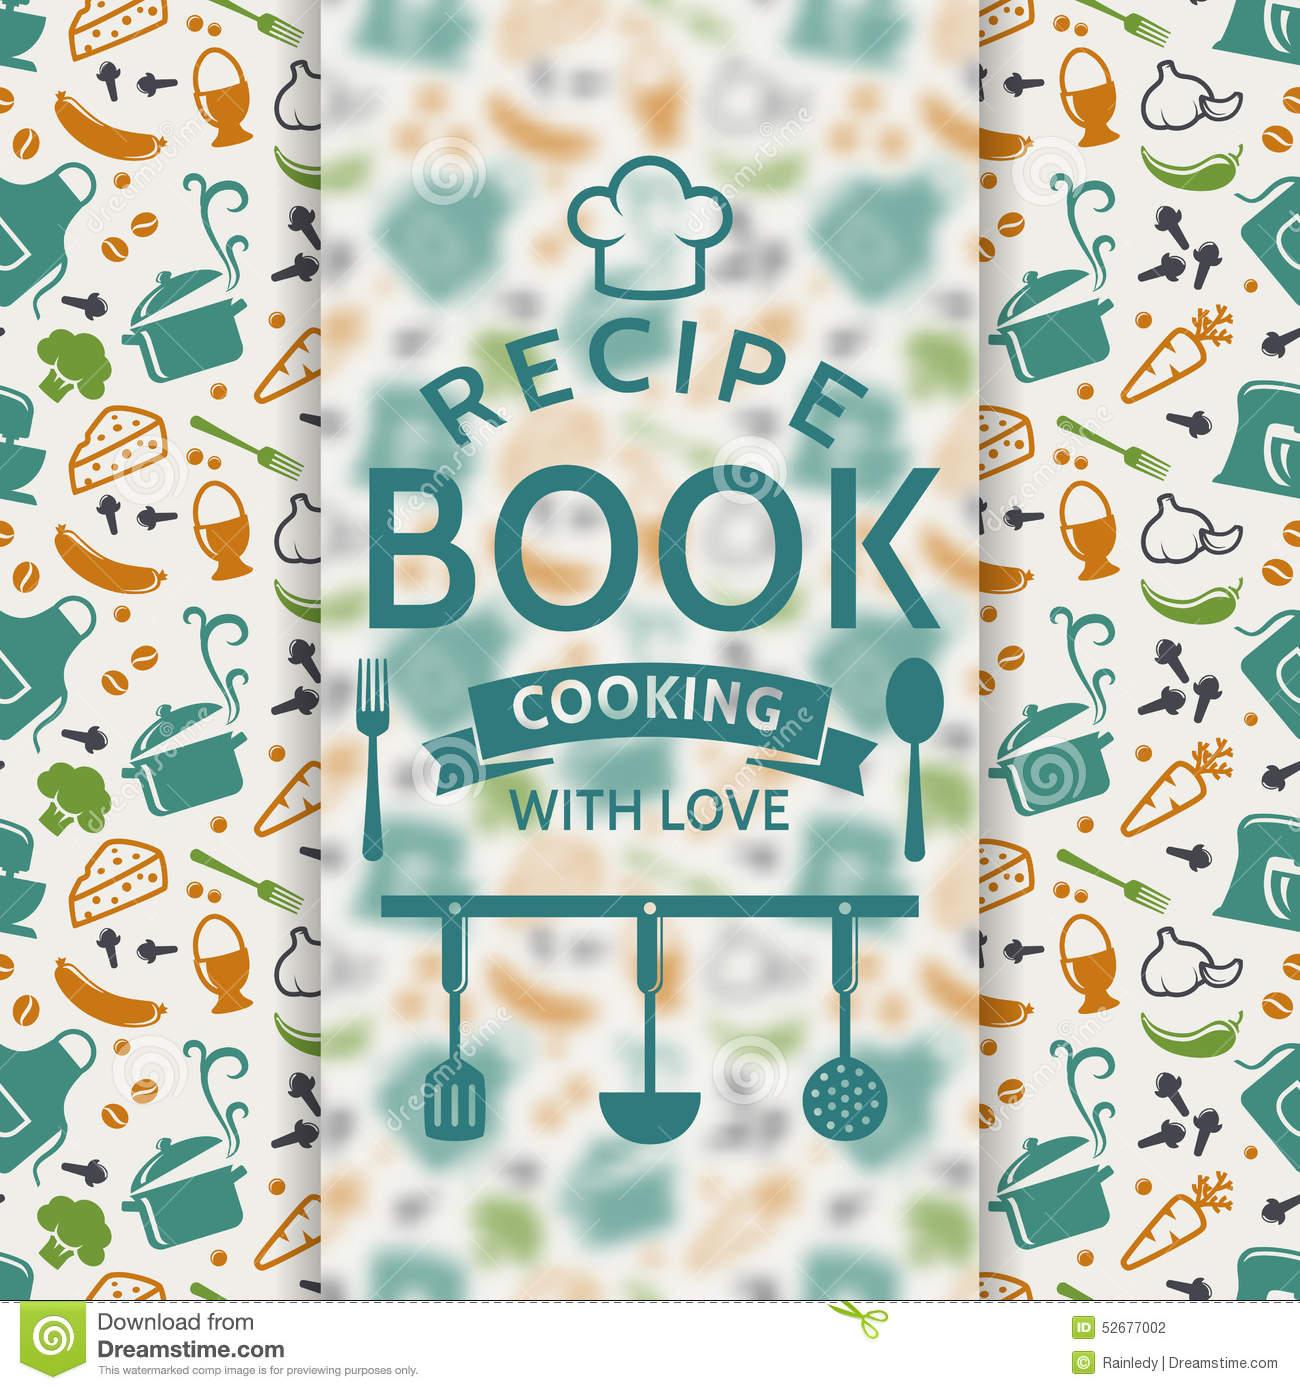 Recipe book cover clipart clip art free Cook / Recipe Book Card Cover Royalty Free Stock Photos - Image ... clip art free